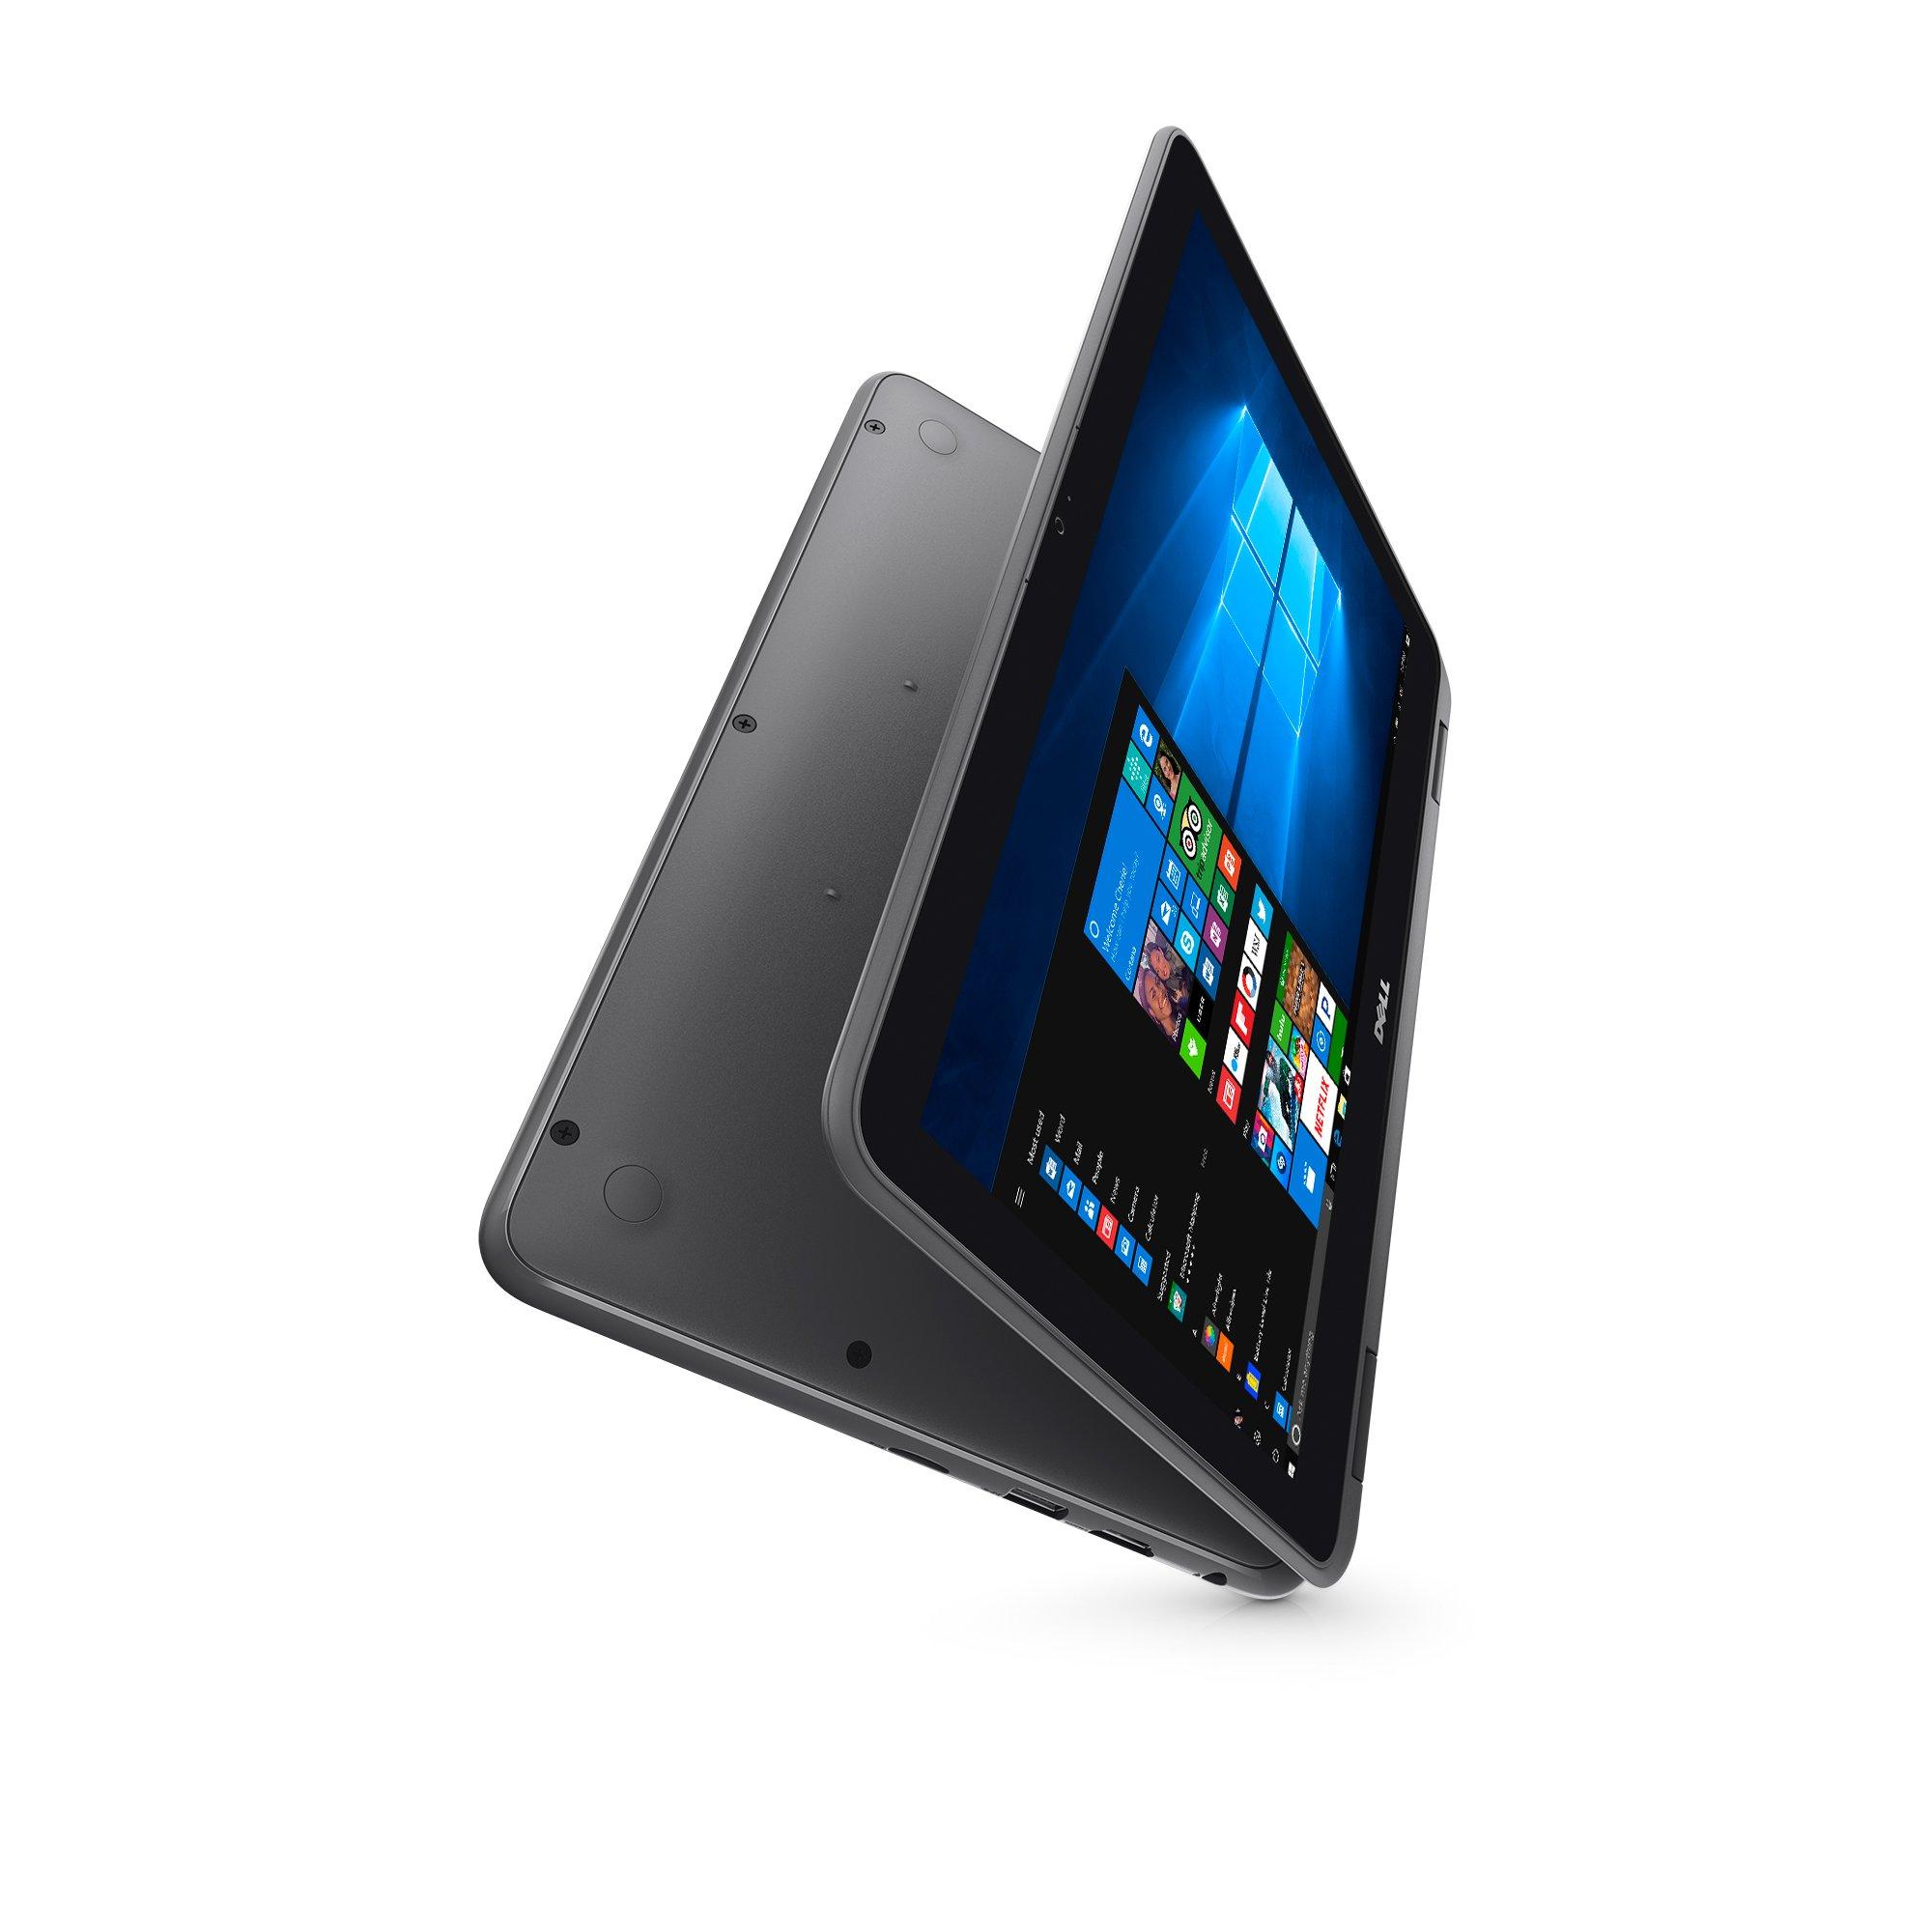 "2018 Dell Inspiron 11.6"" 2-in-1 Convertible HD Touchscreen Laptop - Intel Quad-Core Pentium N3710 1.6GHz, 4GB RAM, 500GB HDD, MaxxAudio, 802.11bgn, Webcam, Bluetooth, HDMI, Win 10"